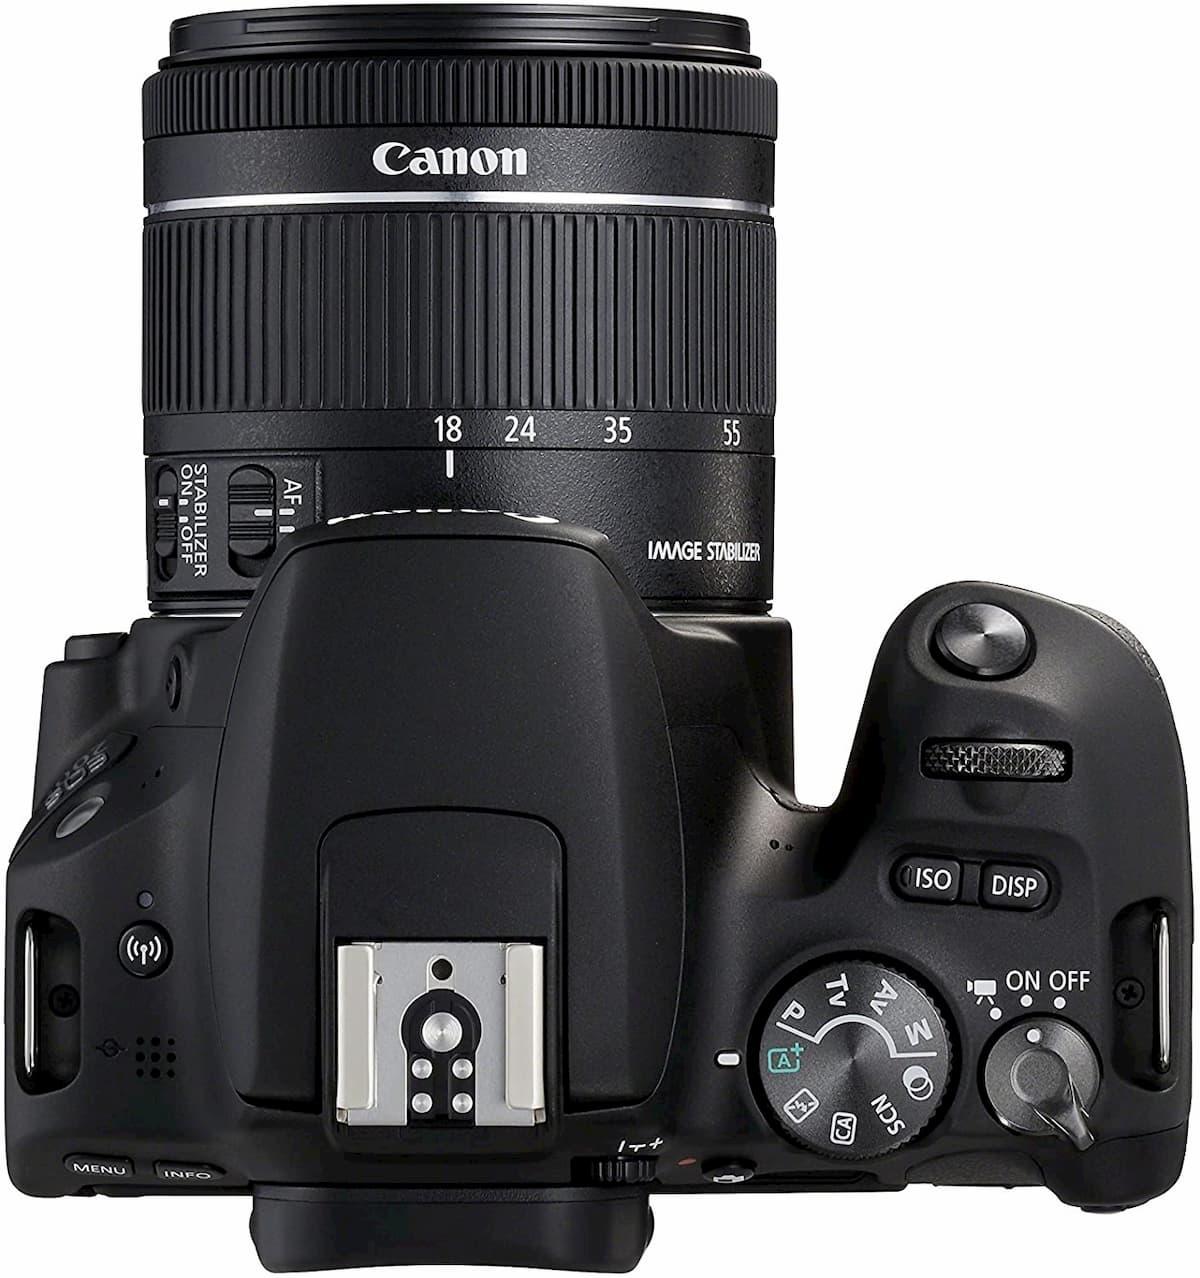 Canon EOS 200D up